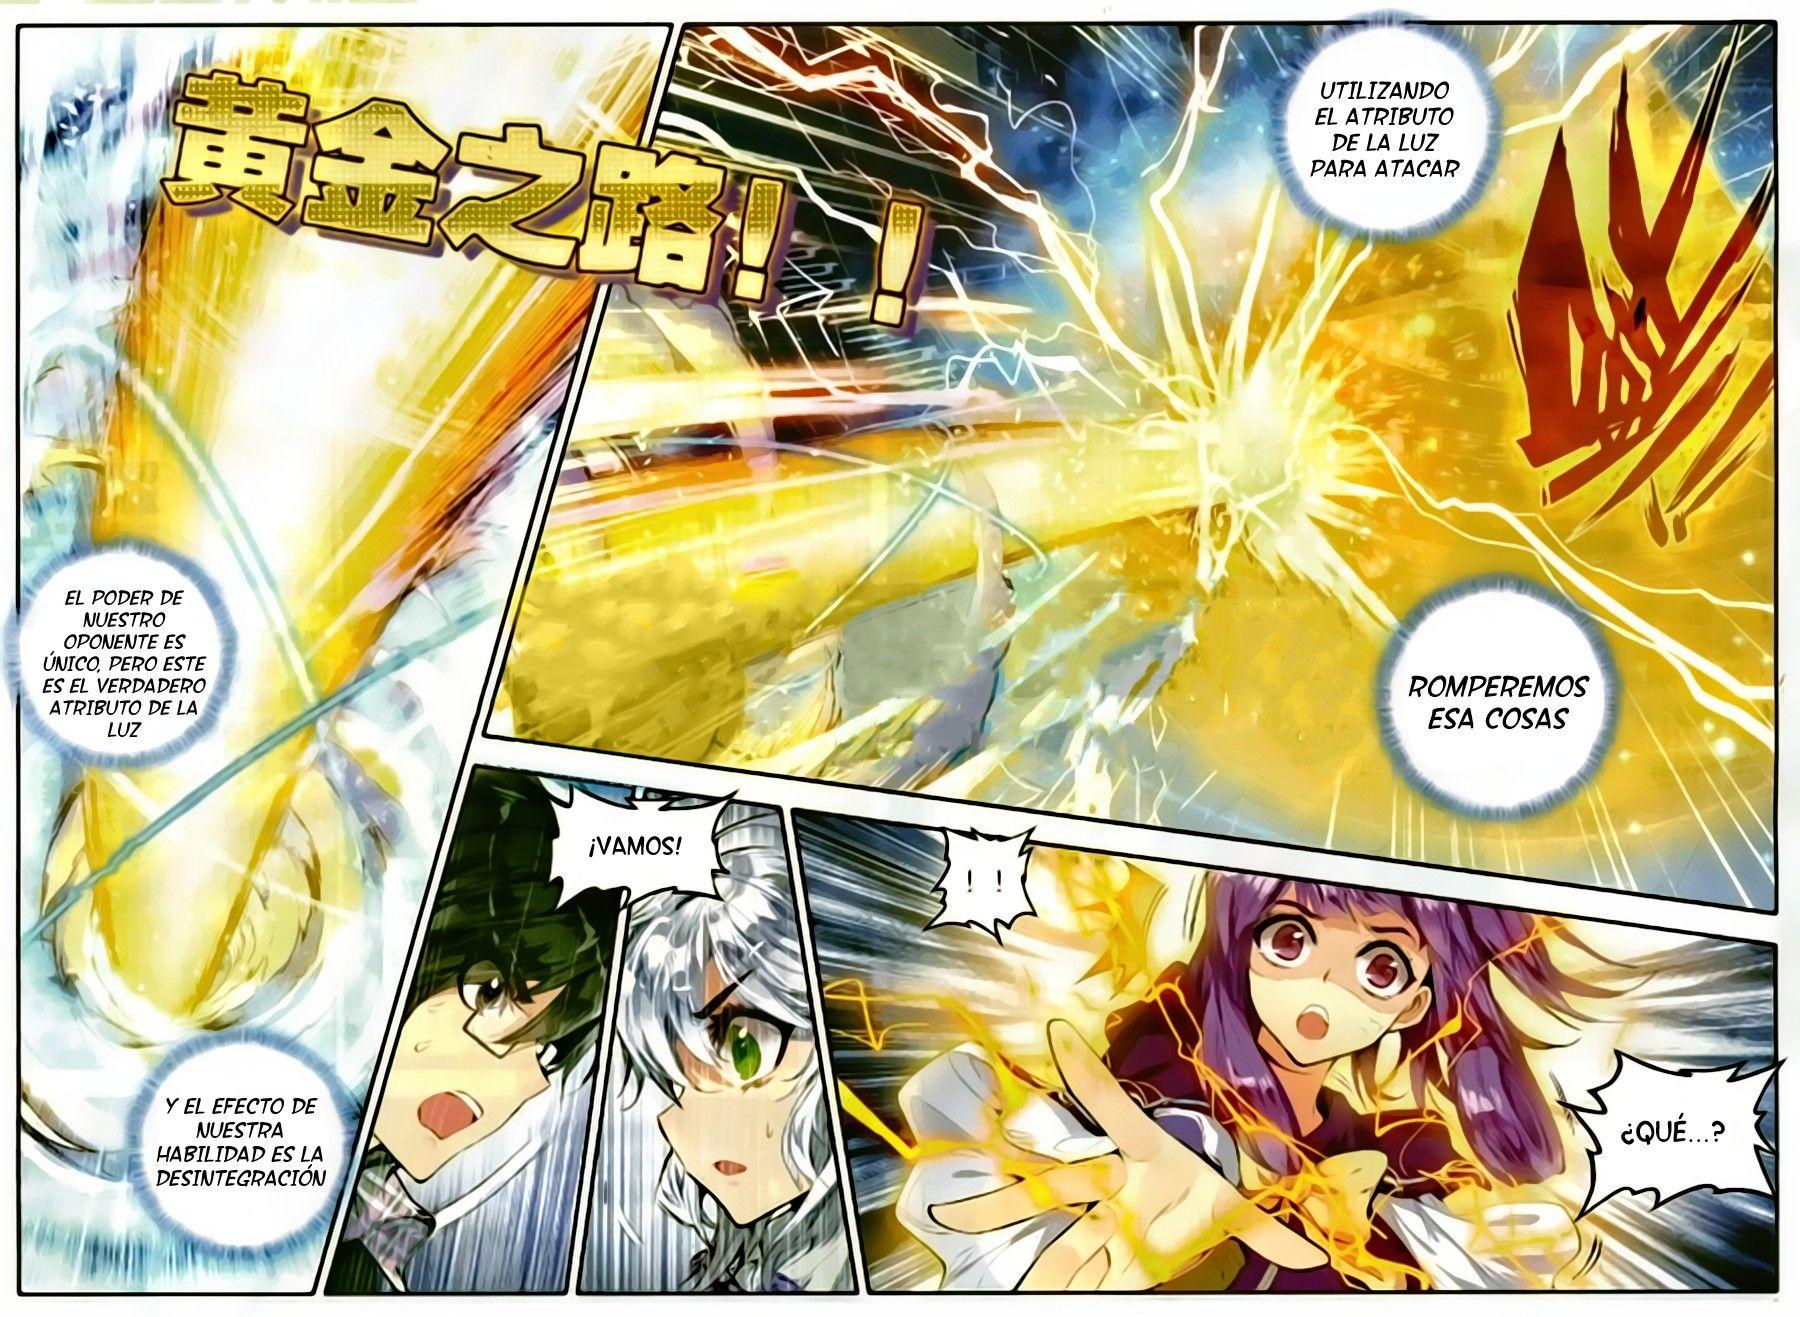 https://c5.ninemanga.com/es_manga/pic2/33/16417/511293/3a932bd942593ecf98d6187897e98d70.jpg Page 6